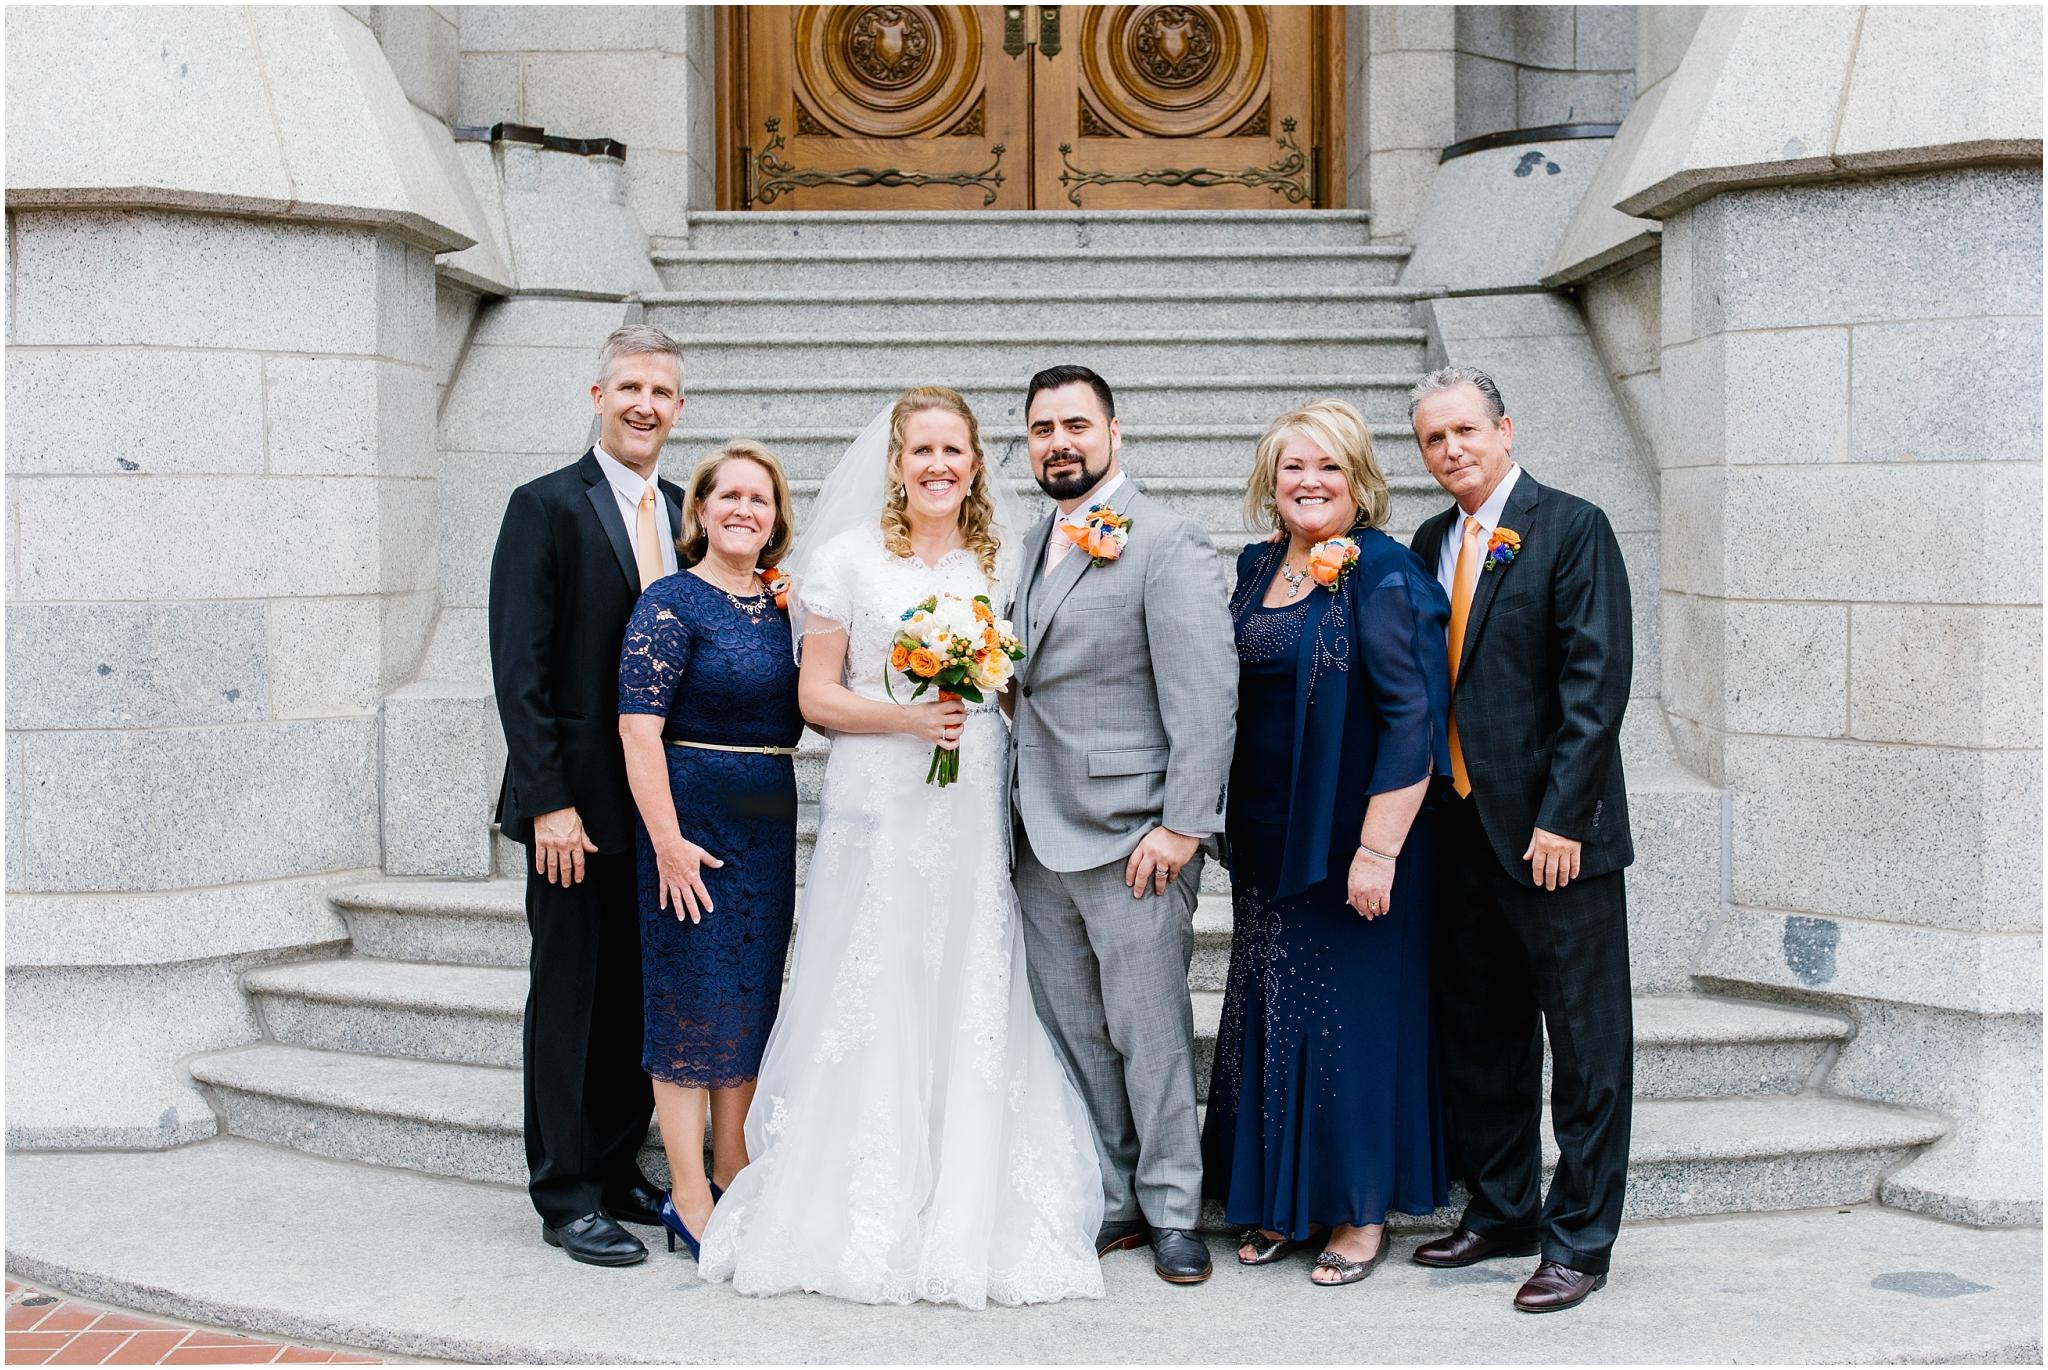 Justin and Melissa-53_Lizzie-B-Imagery-Utah-Wedding-Photographer-Salt-Lake-City-Temple-The-Grand-Ballroom.jpg